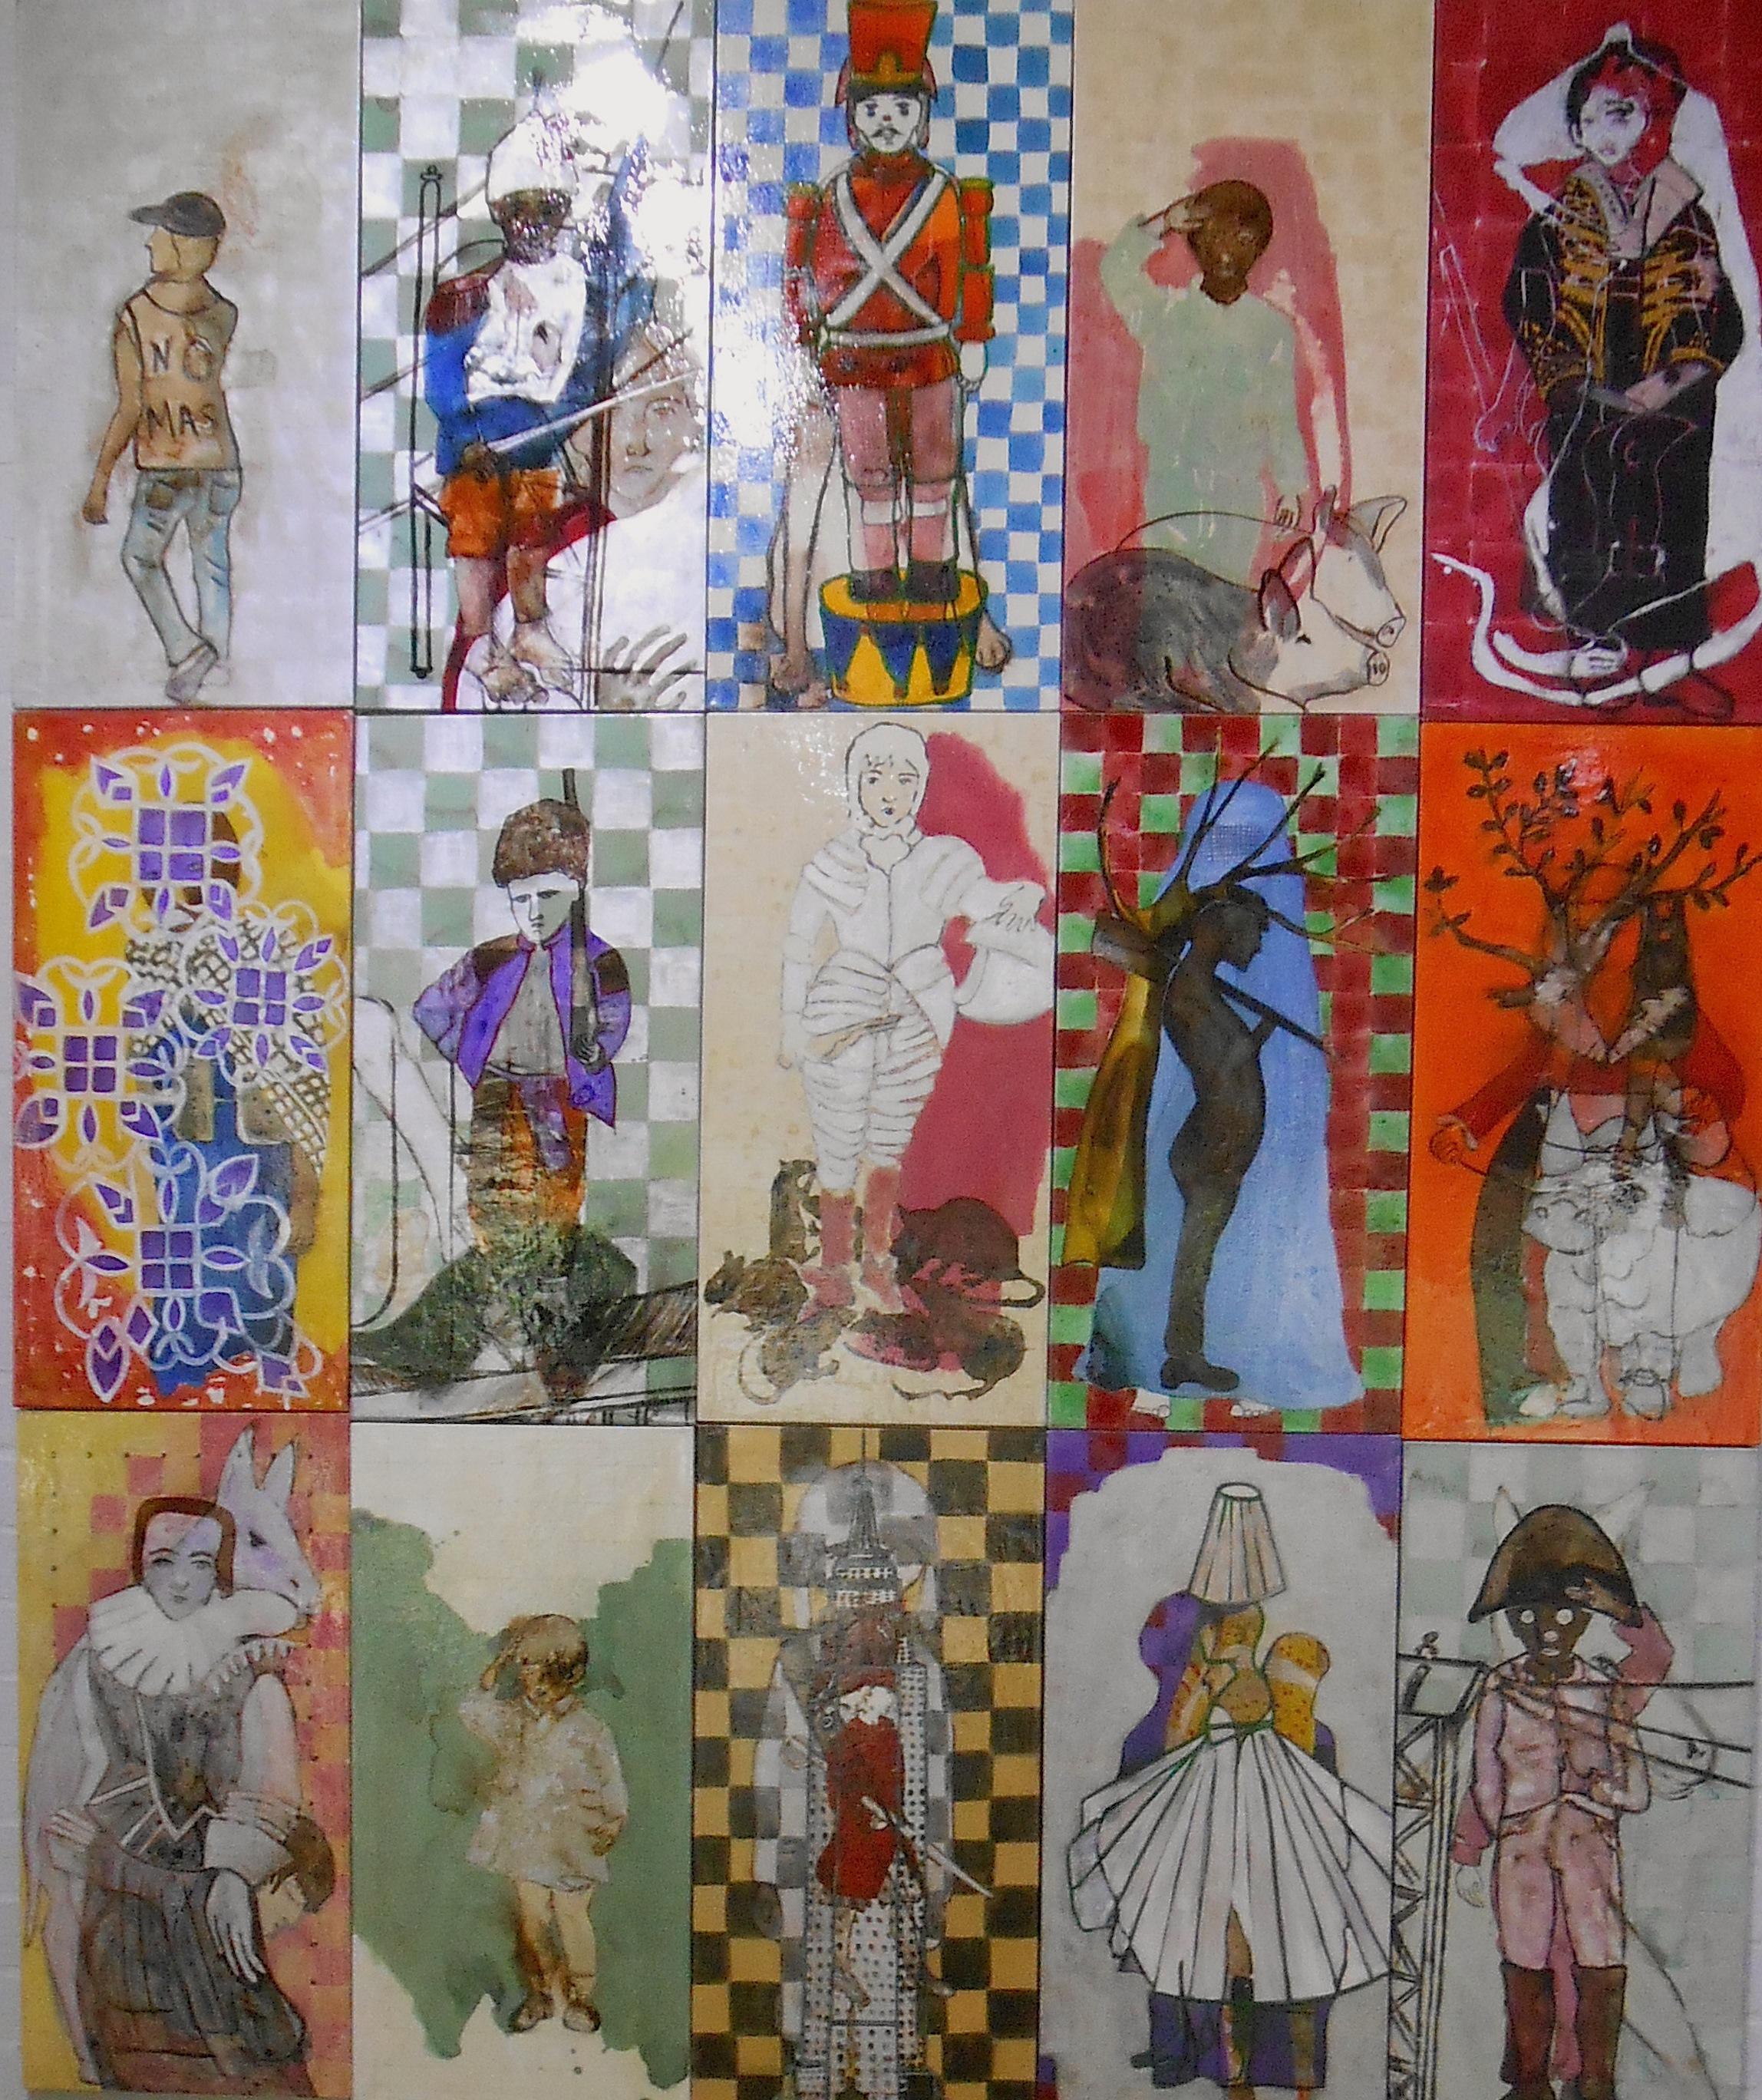 Mosaico Combatientes / Mosaic Combatants